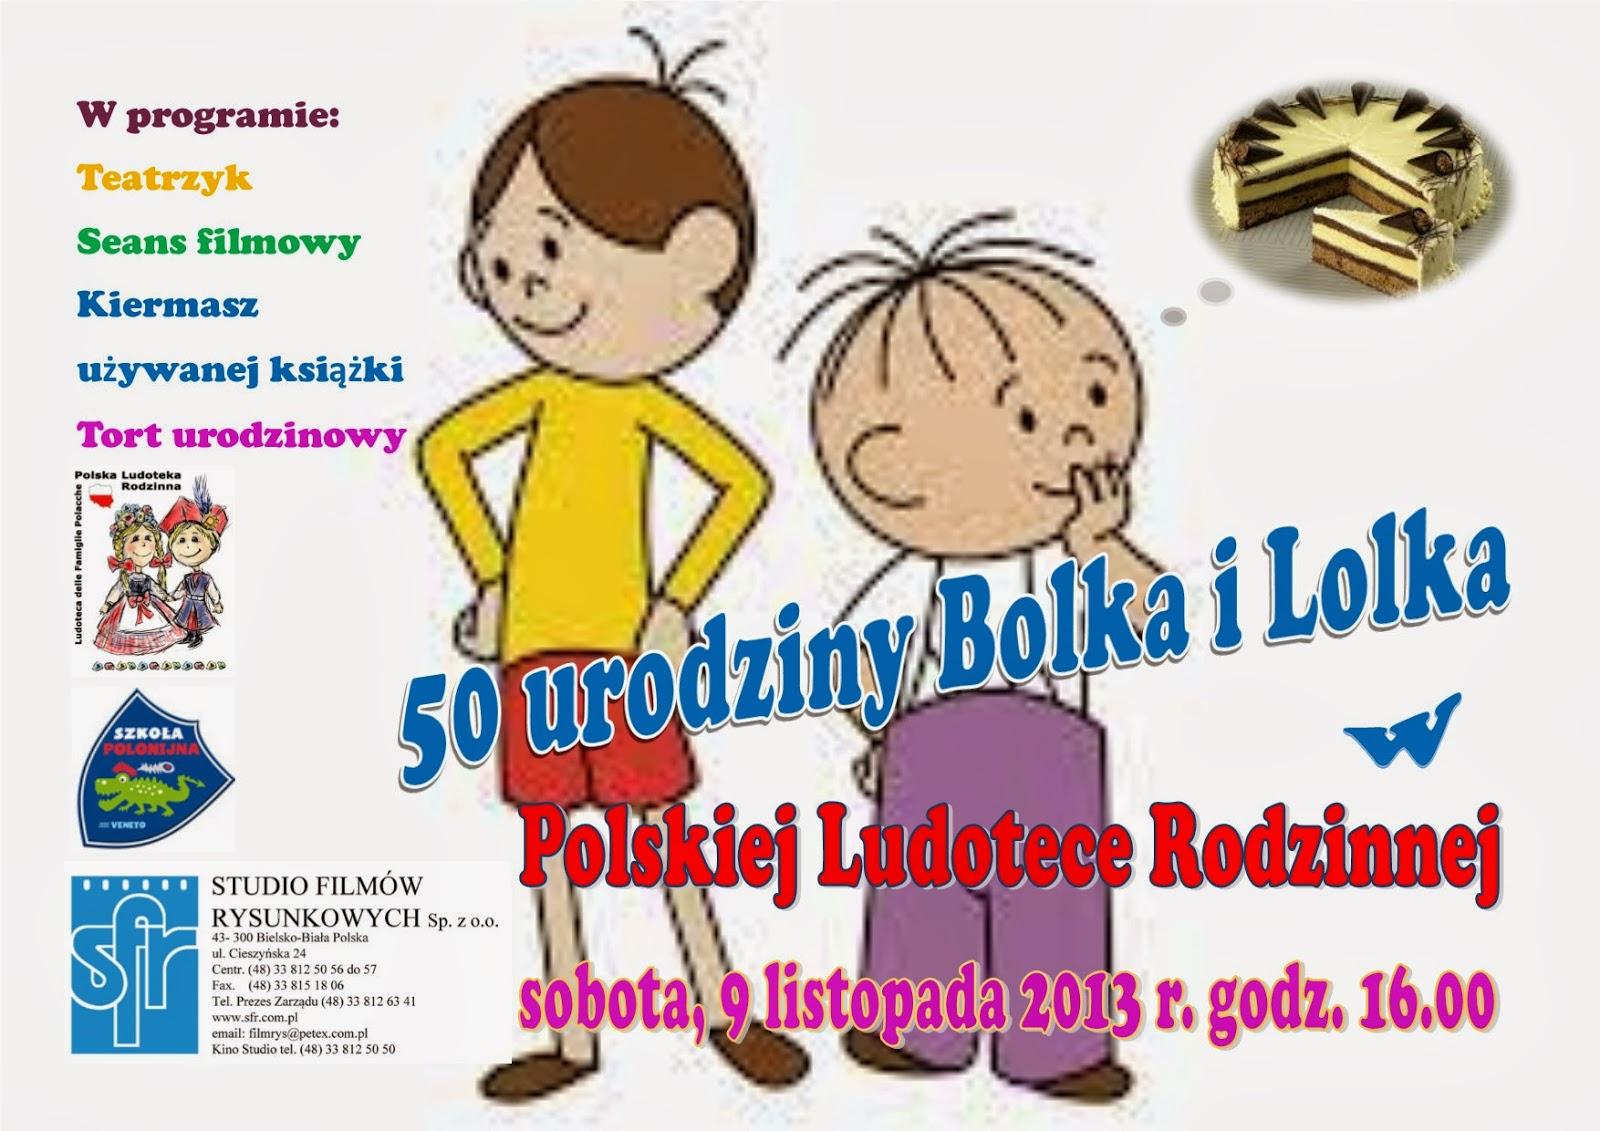 Polska ludoteka rodzinna ludoteca delle famiglie